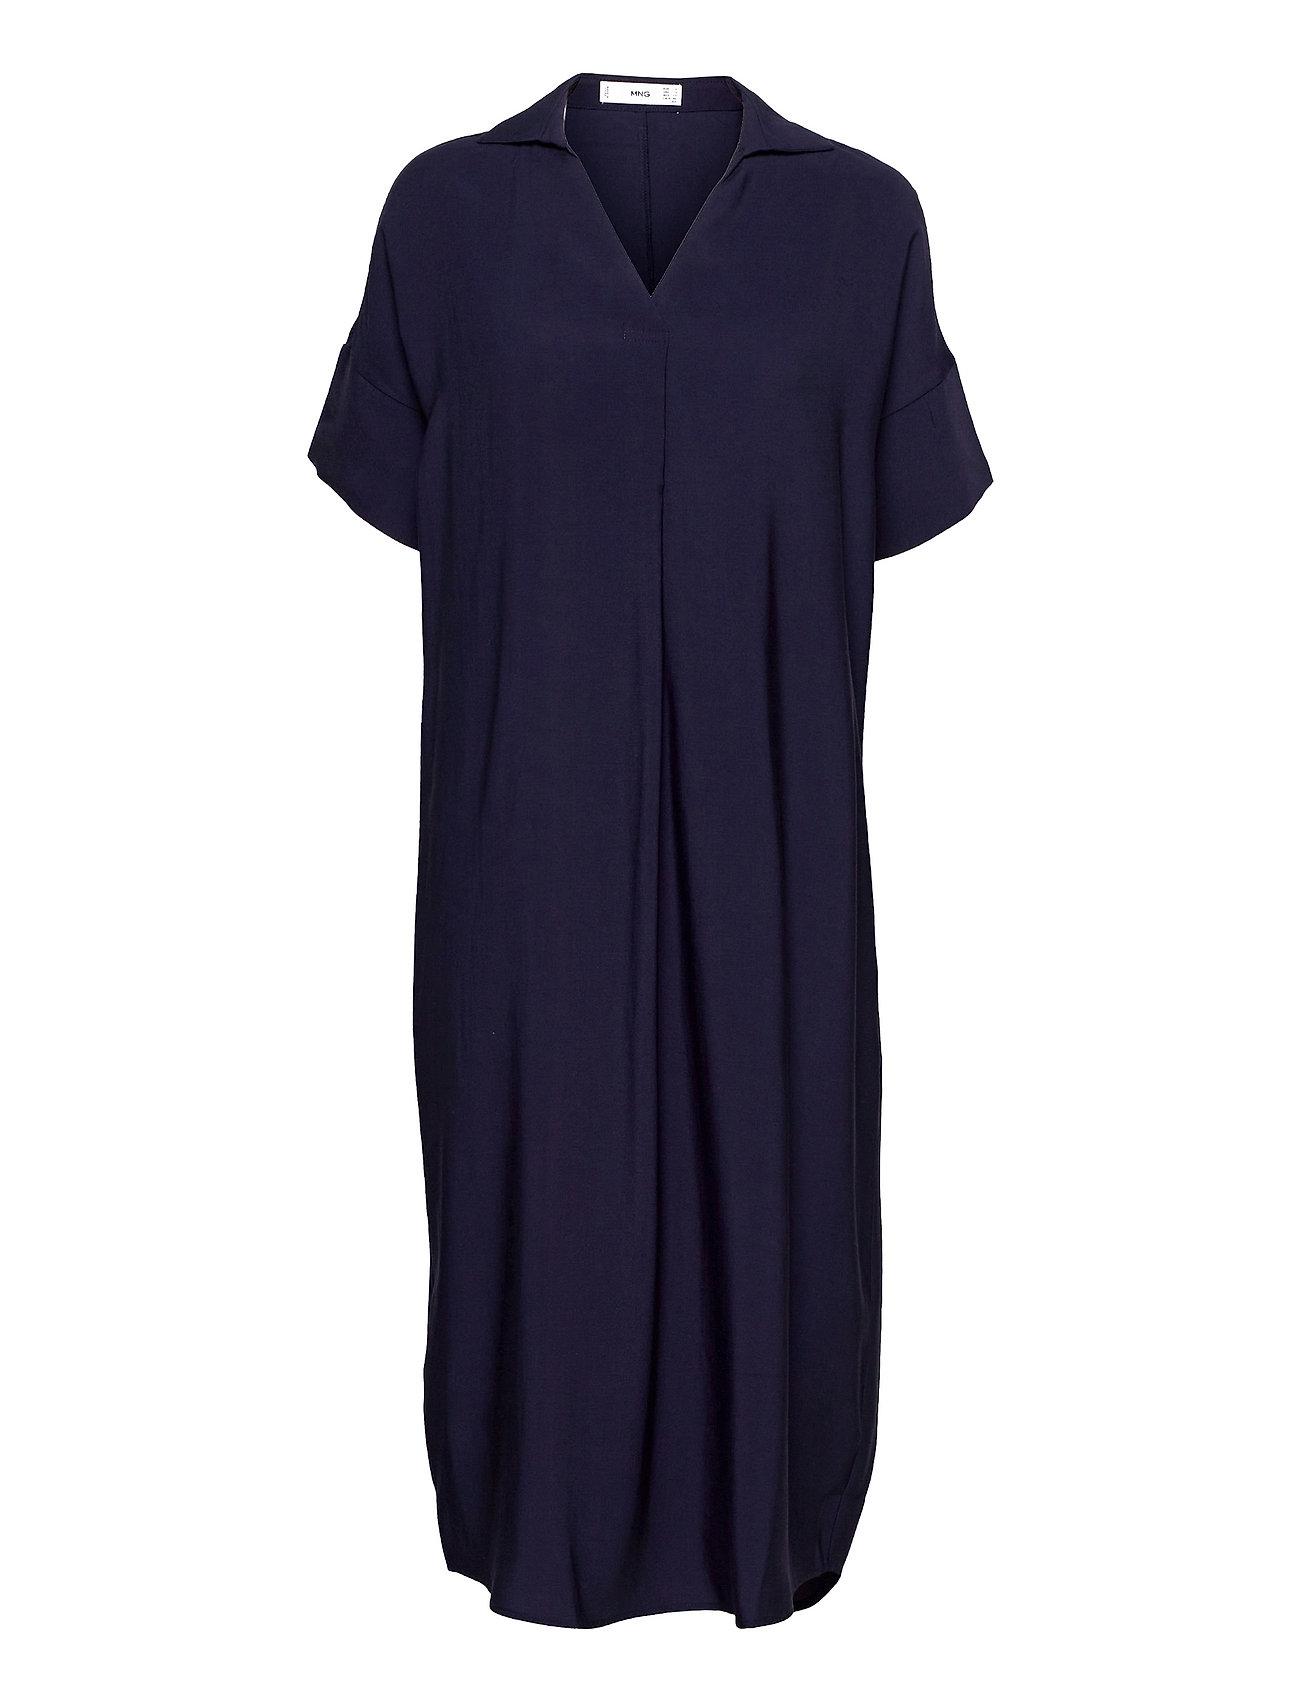 Byel-H Dresses Everyday Dresses Blå Mango